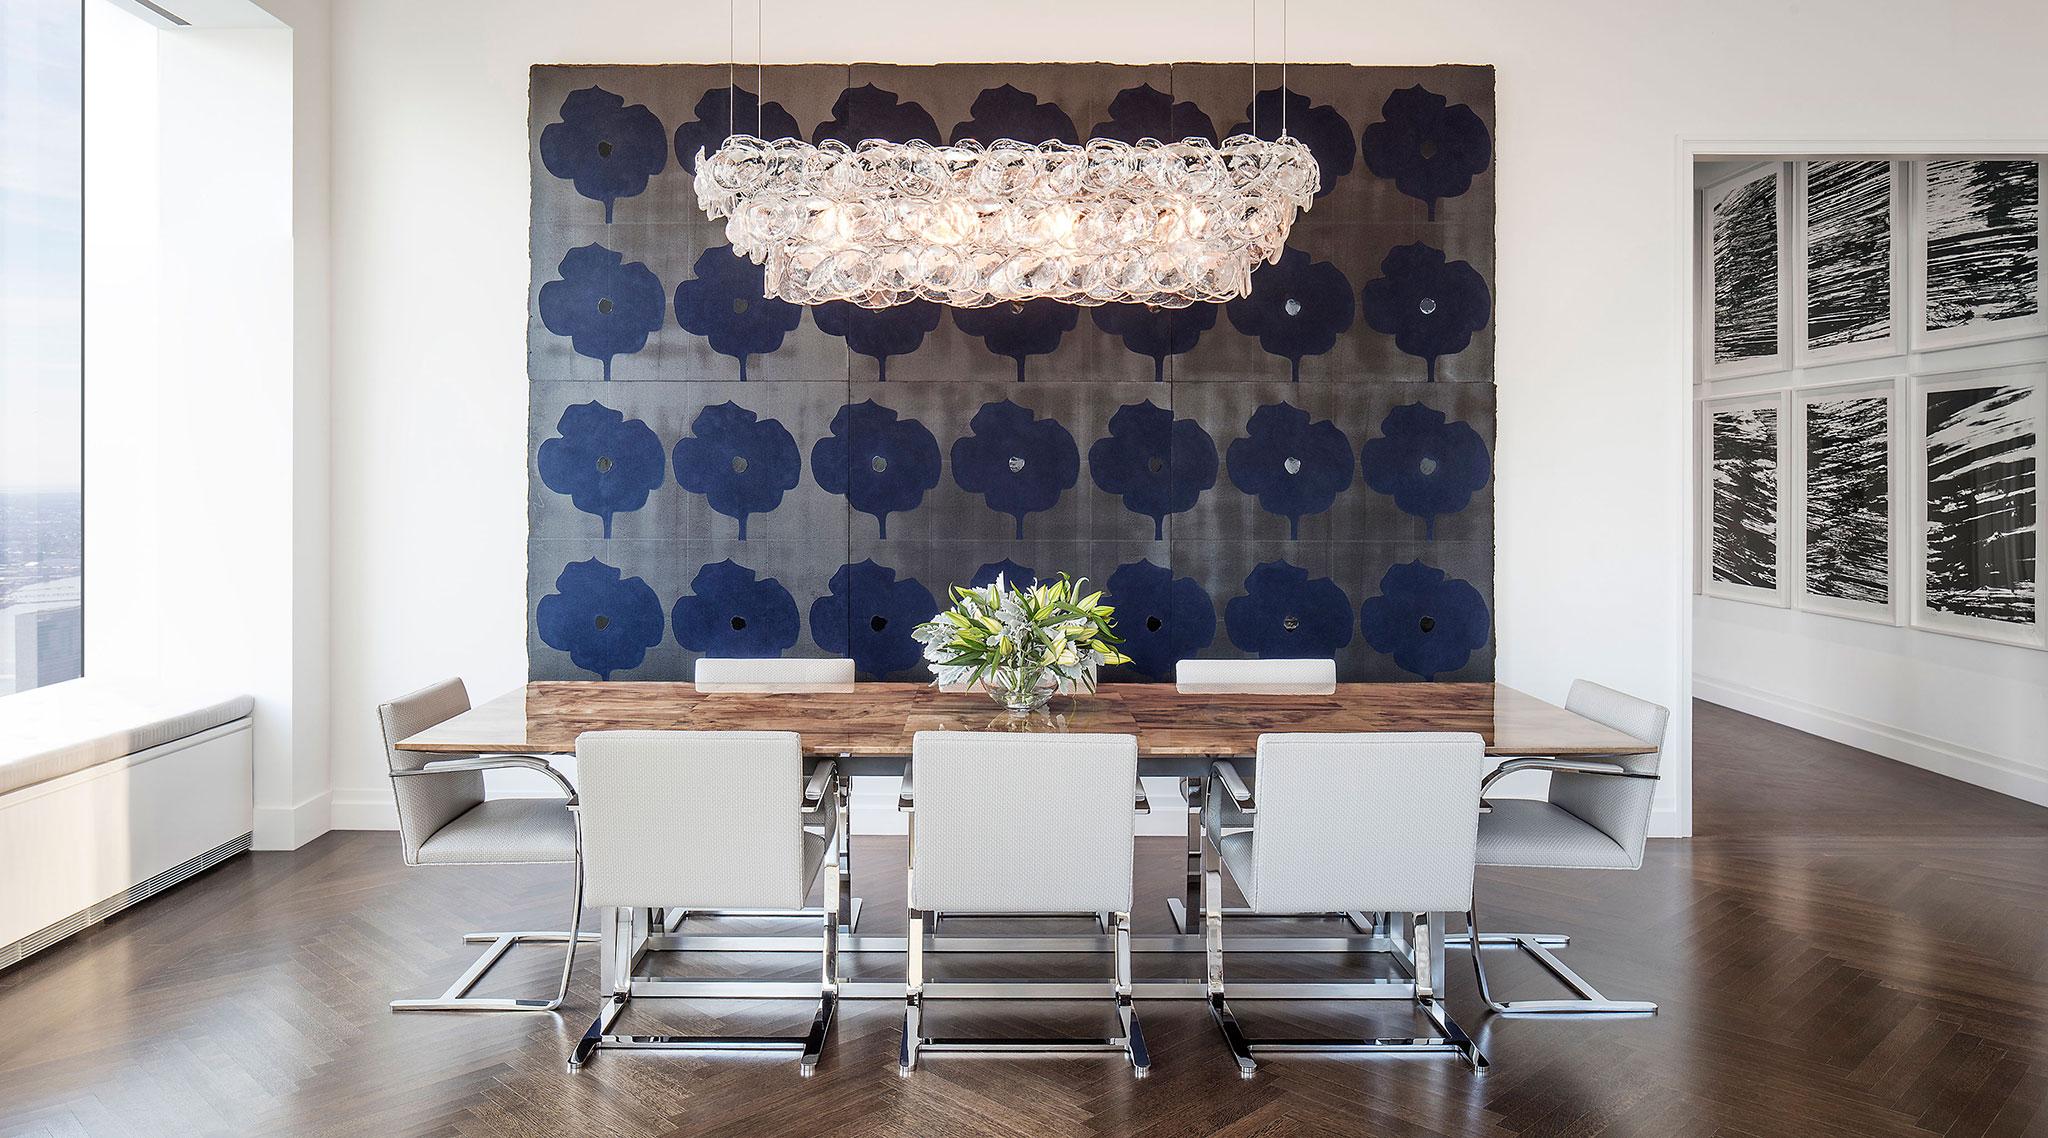 2 Bedroom Apartments For Sale In Nyc Concept Interior 432 Park Avenue Condominiums